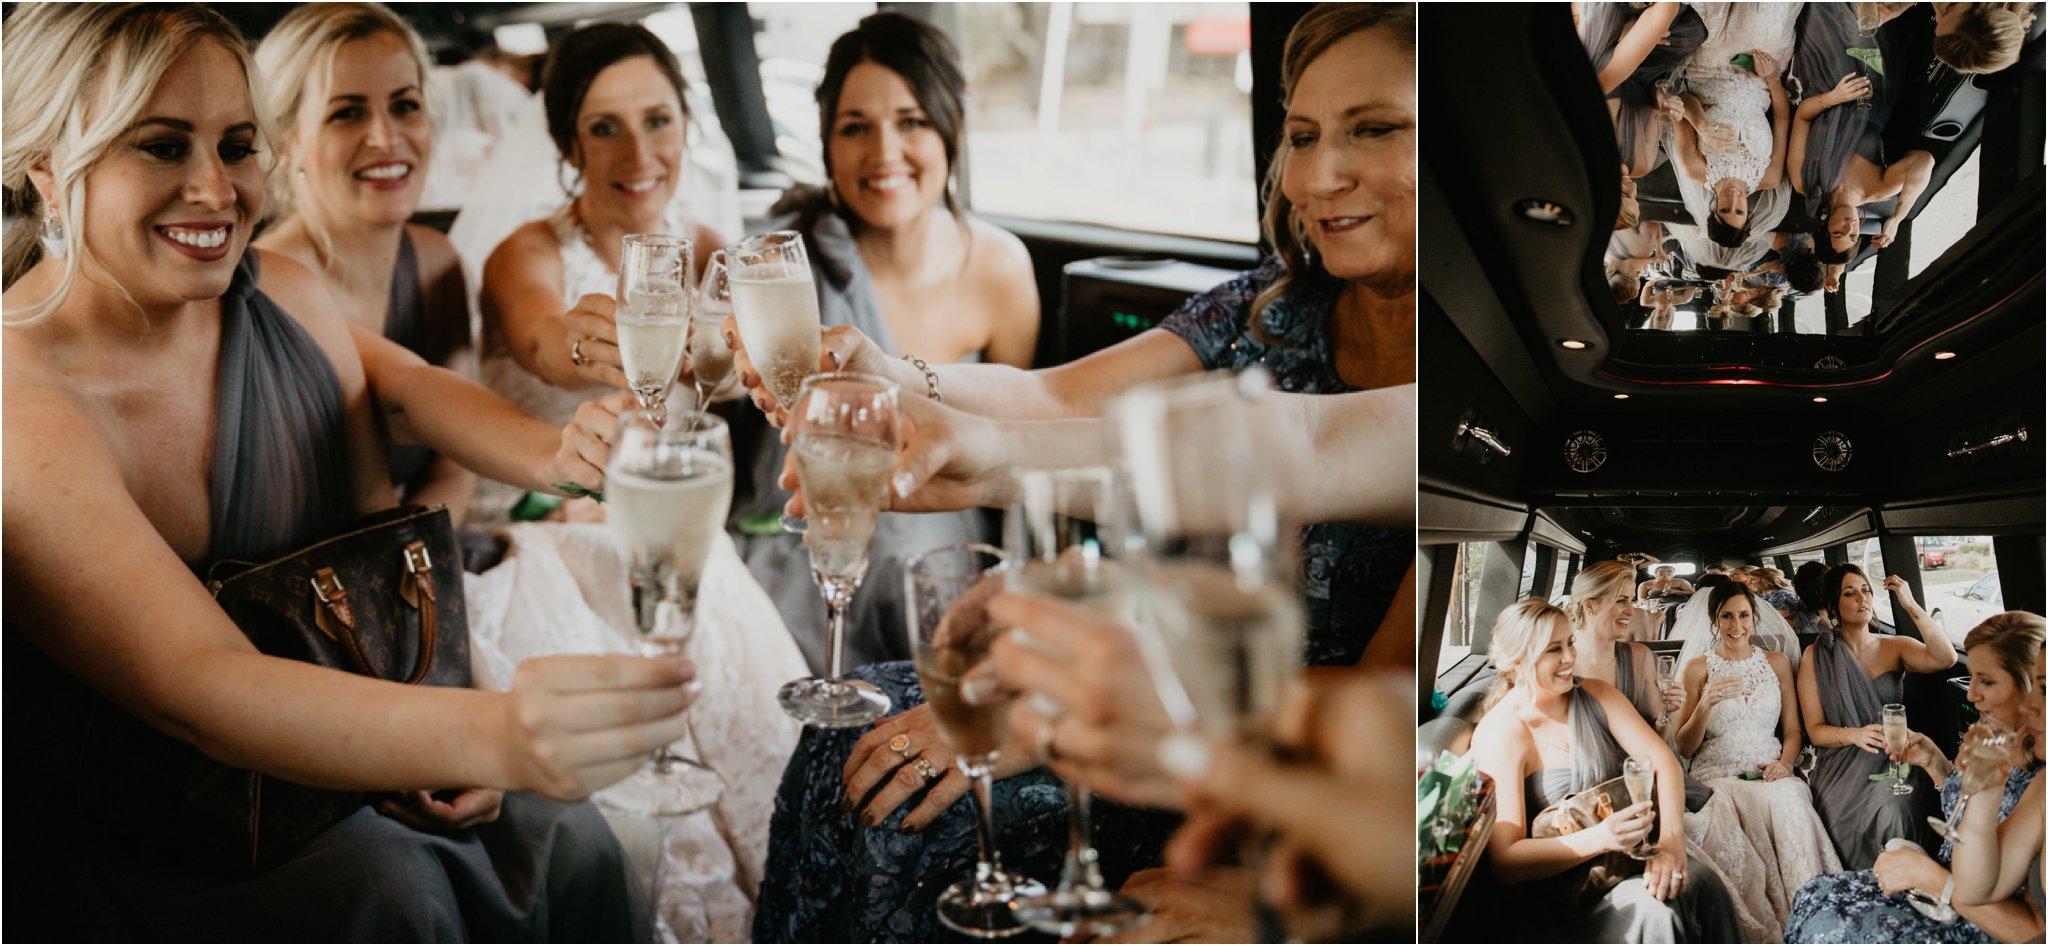 Patrick Henry Ballroom - Weddings - Virginia Wedding Photographer - Pat Cori Photography-45.jpg